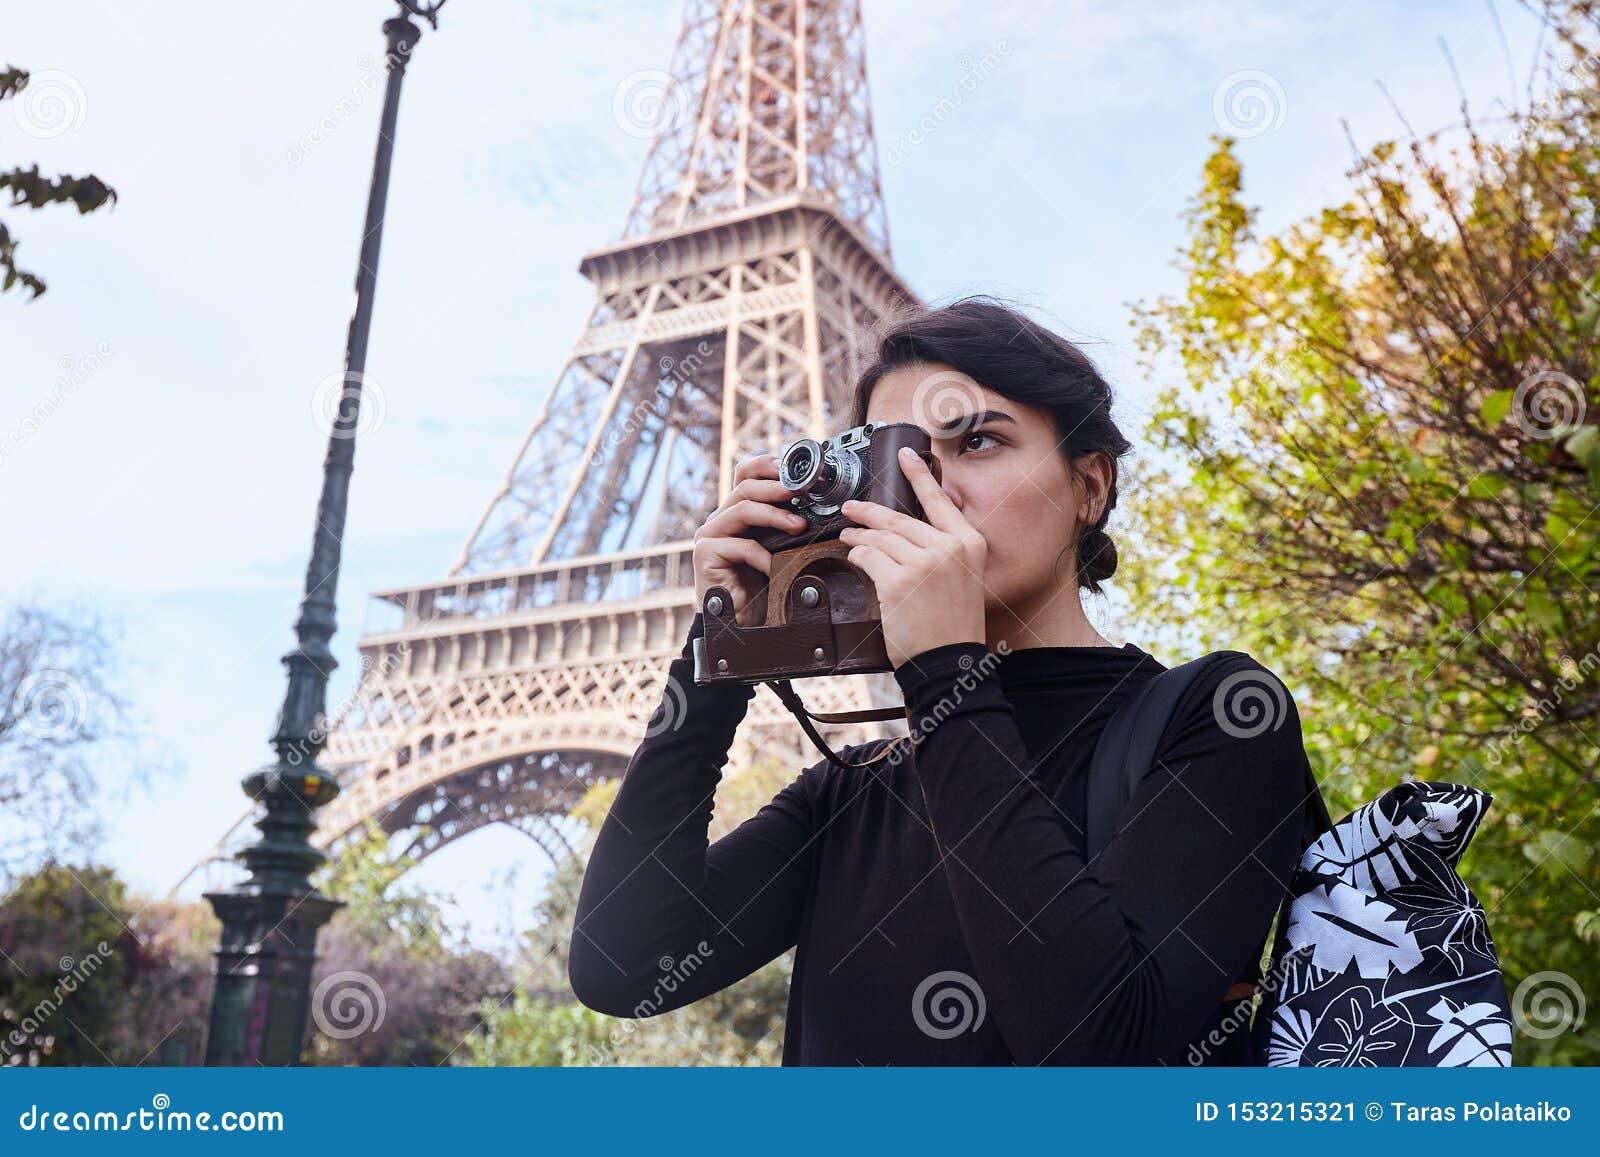 Cel mai bun site de dating Nantes Agen ia de dating Badoo